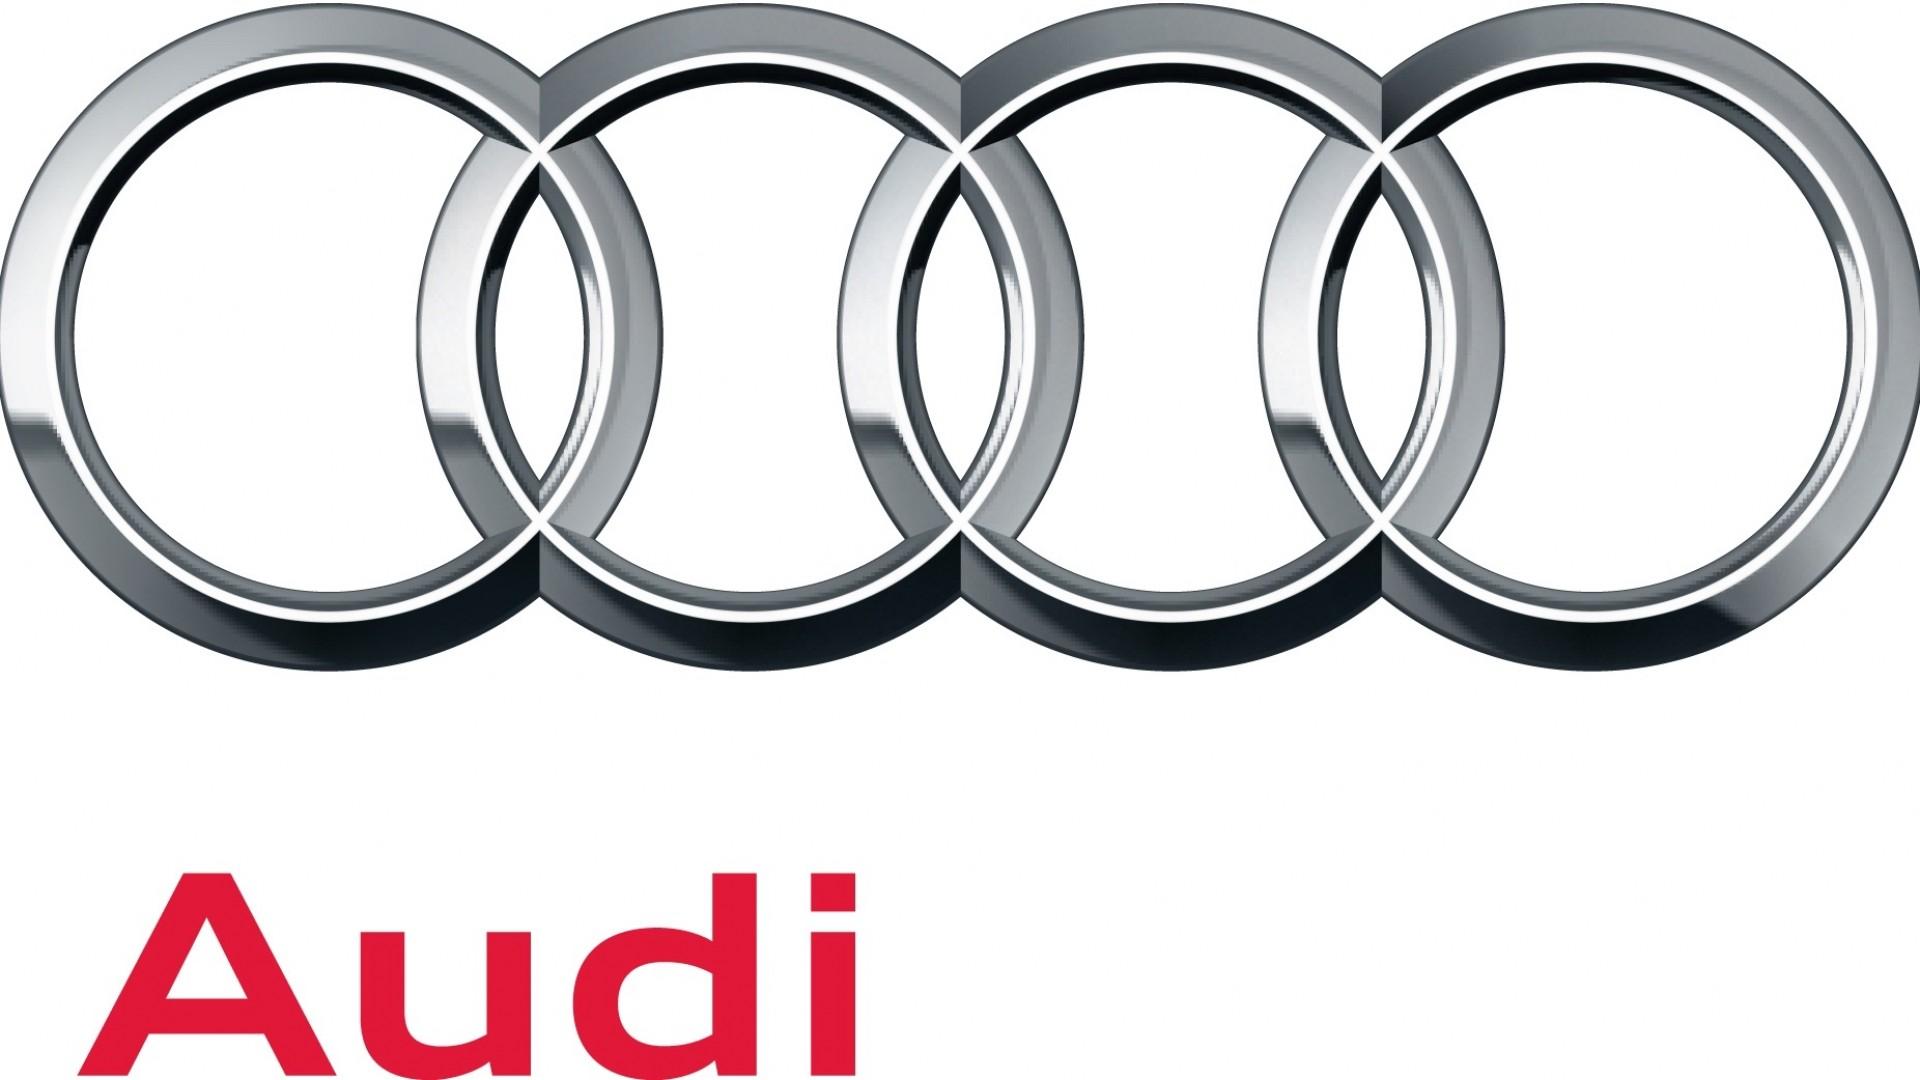 Audi Logo Wallpaper HD Wallpapers Backgrounds Images Art Photos 1920x1080